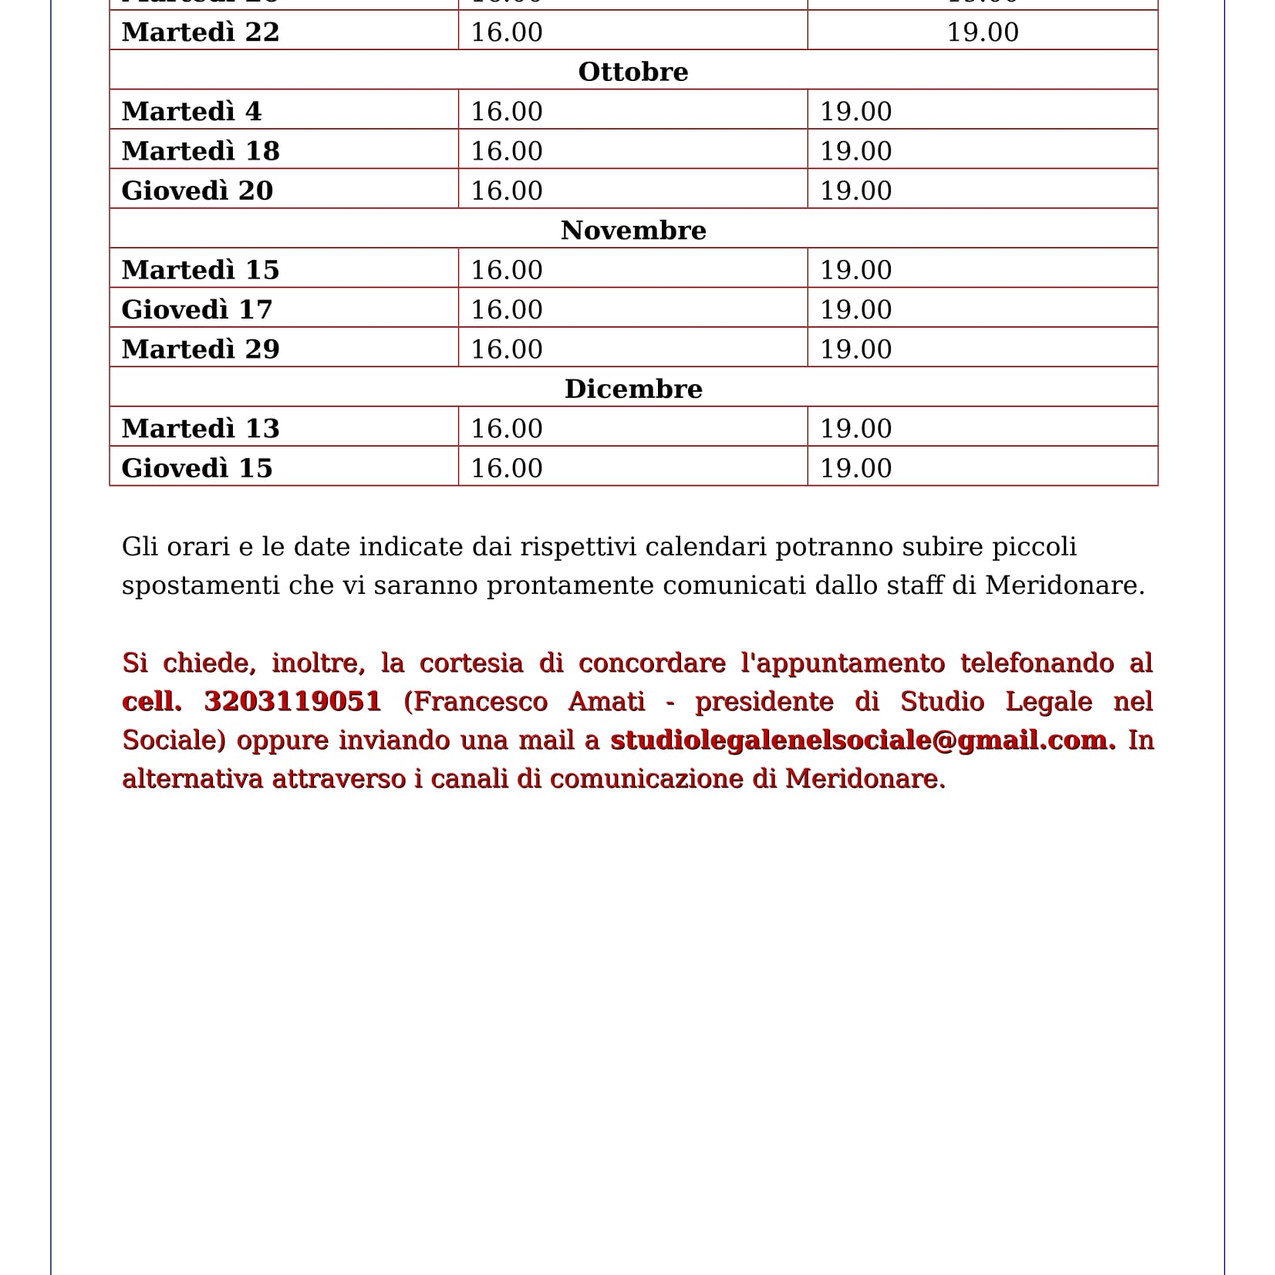 CALENDARIO SPORTELLO LEGALE MERIDONARE 2016-2